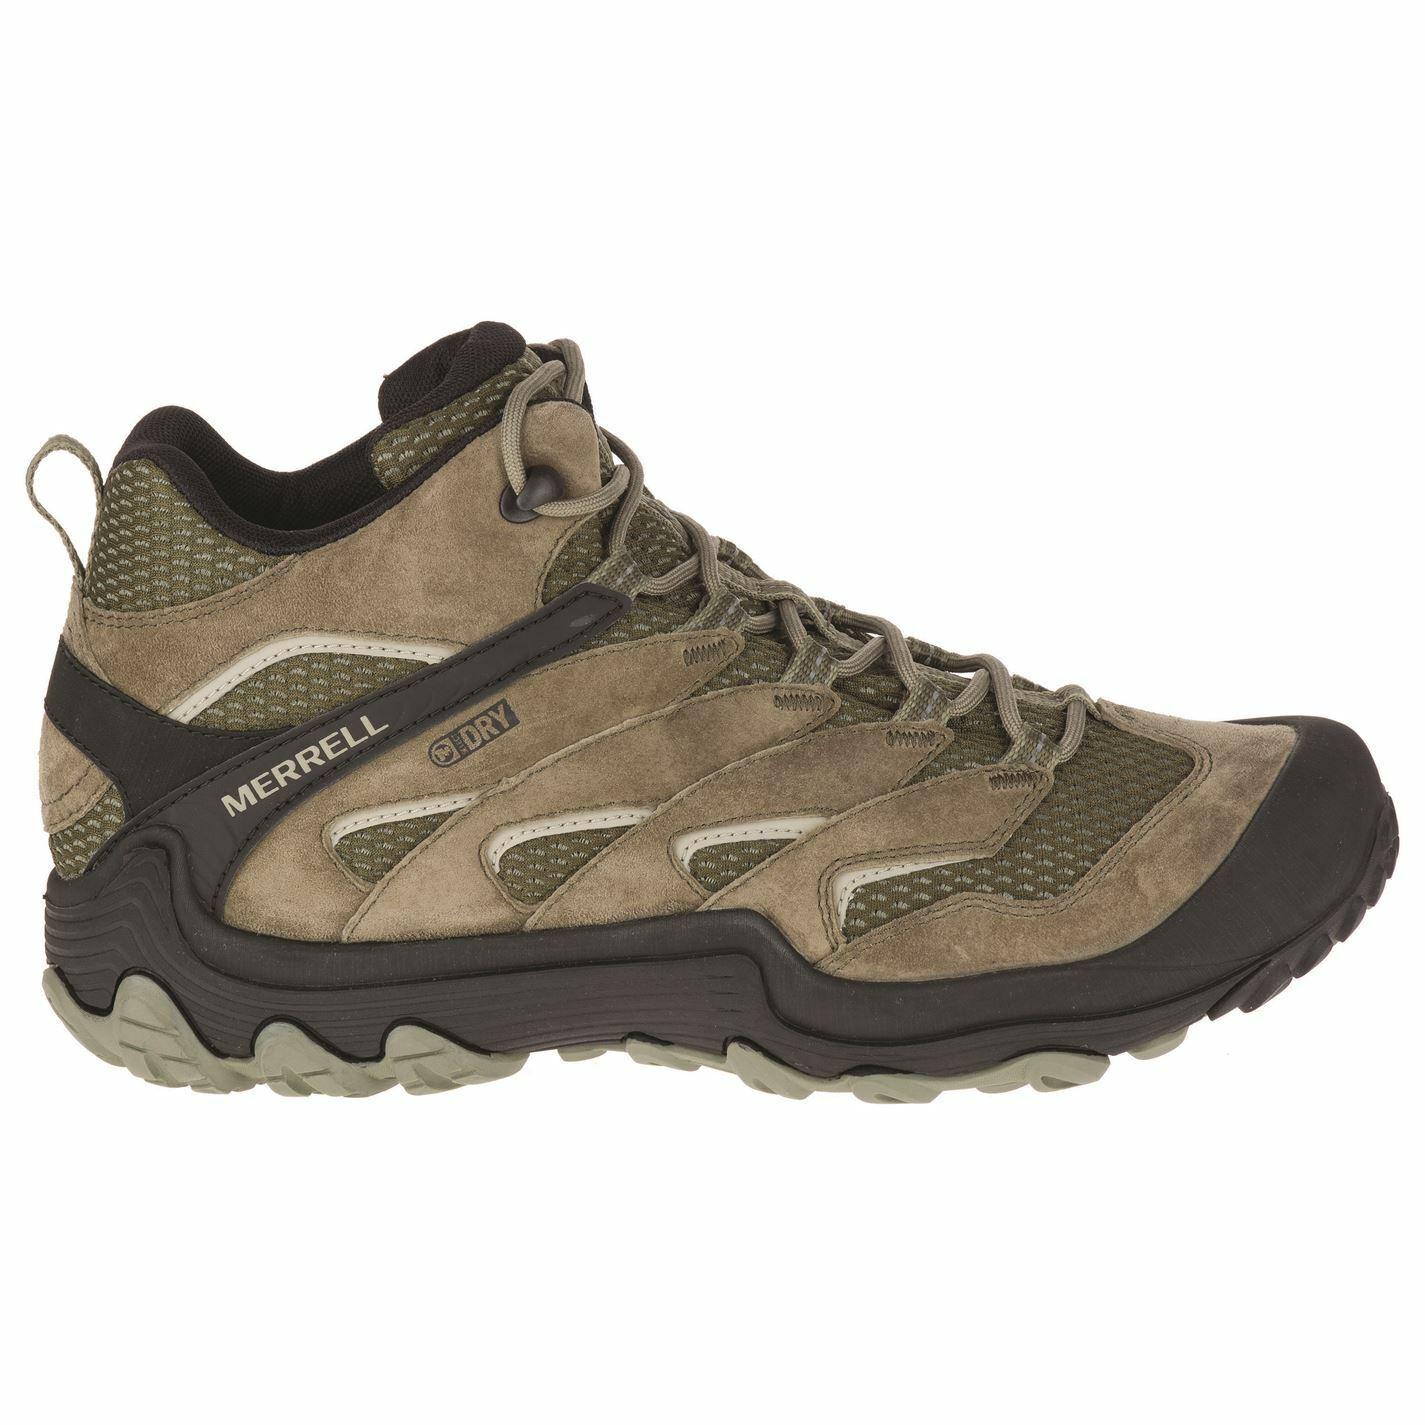 Merrell Mens Charm 7 Walking Stiefel Waterproof